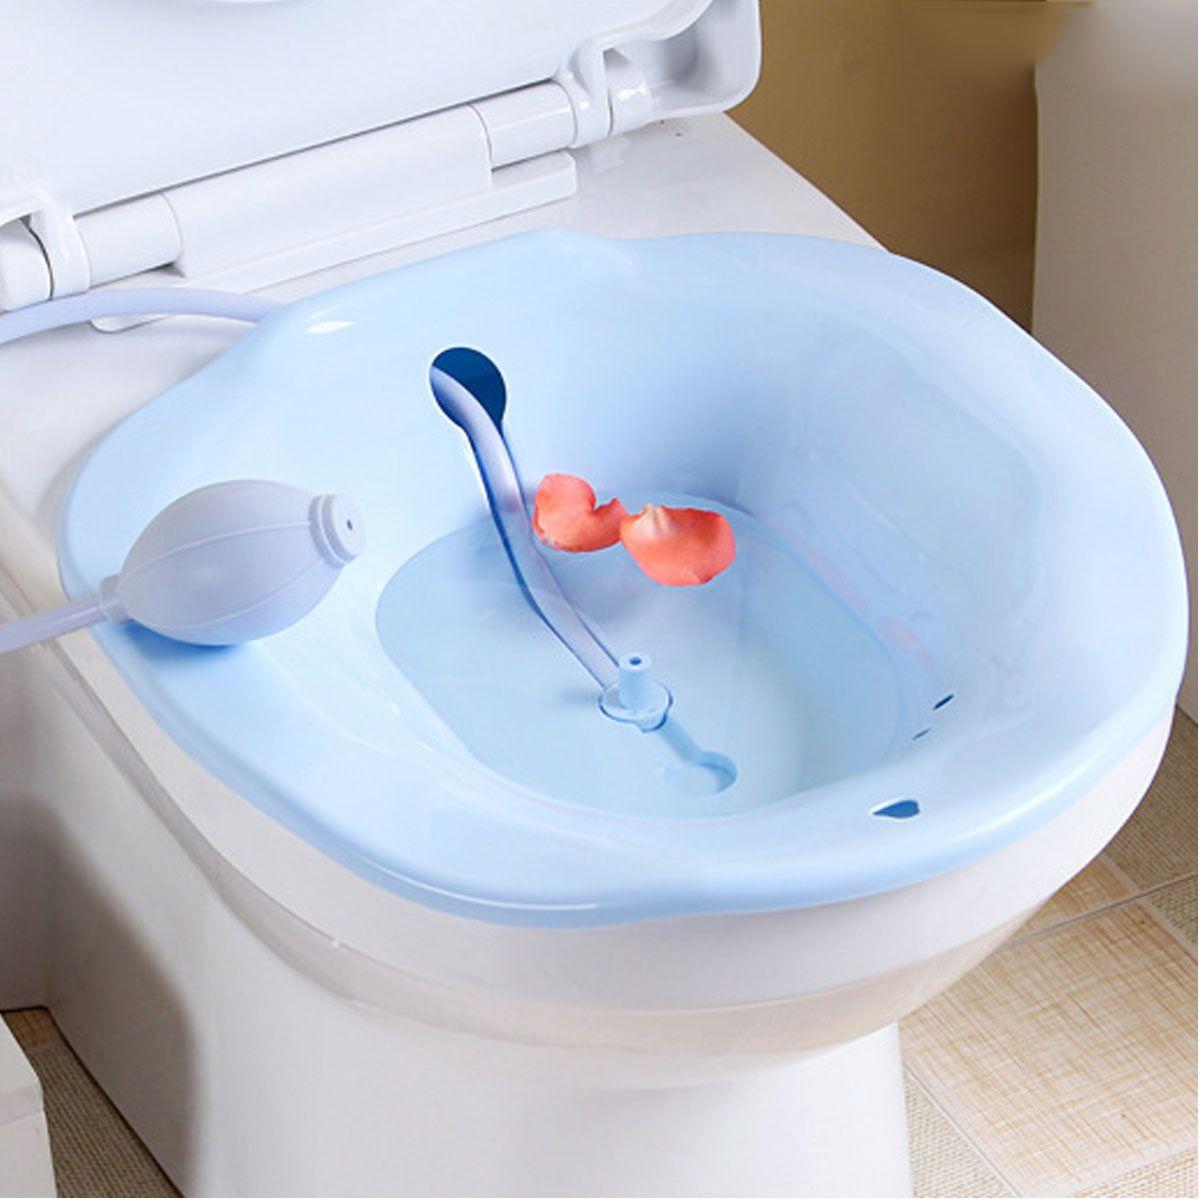 Hemorrhoids Therapy Sitz Bath Toilet Bidet Tub Pregnant Woman ...